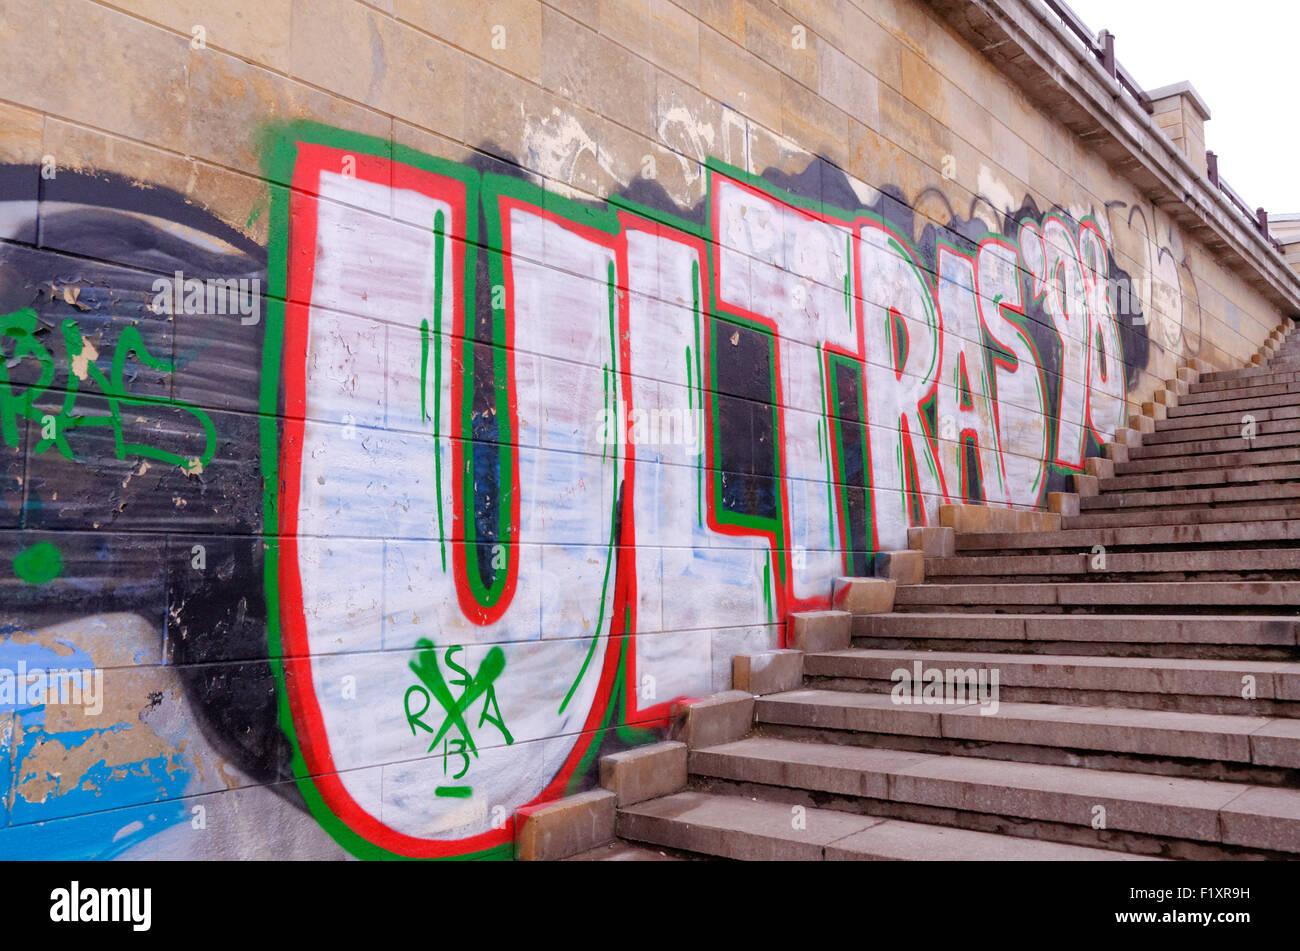 Russian ultras - graffiti promoting the violent football supporters in Russia, Kazan, Tatarstan - Stock Image